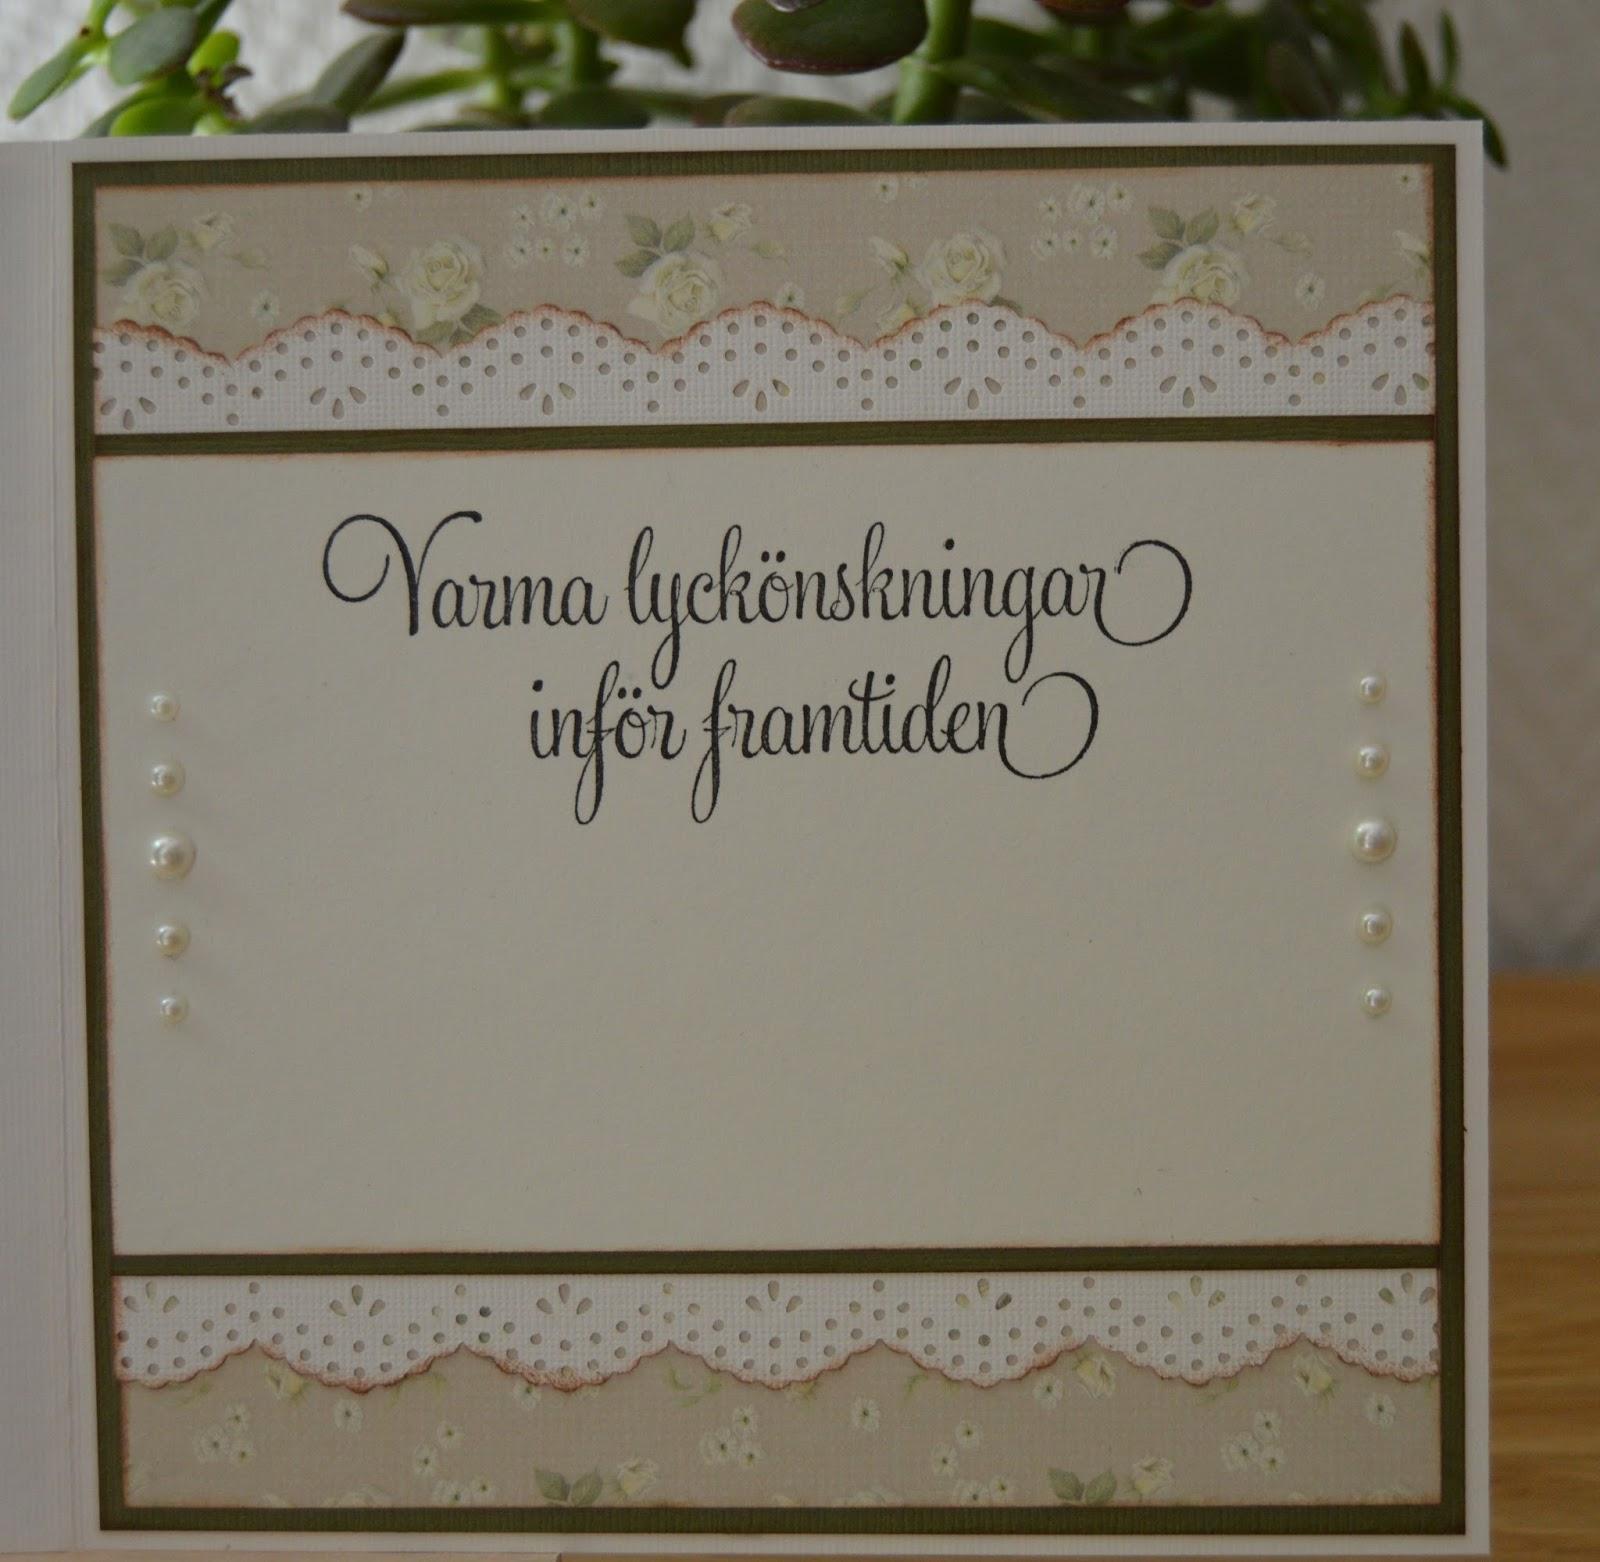 bröllopskort grattis text KortMilla: Bröllopskort! bröllopskort grattis text